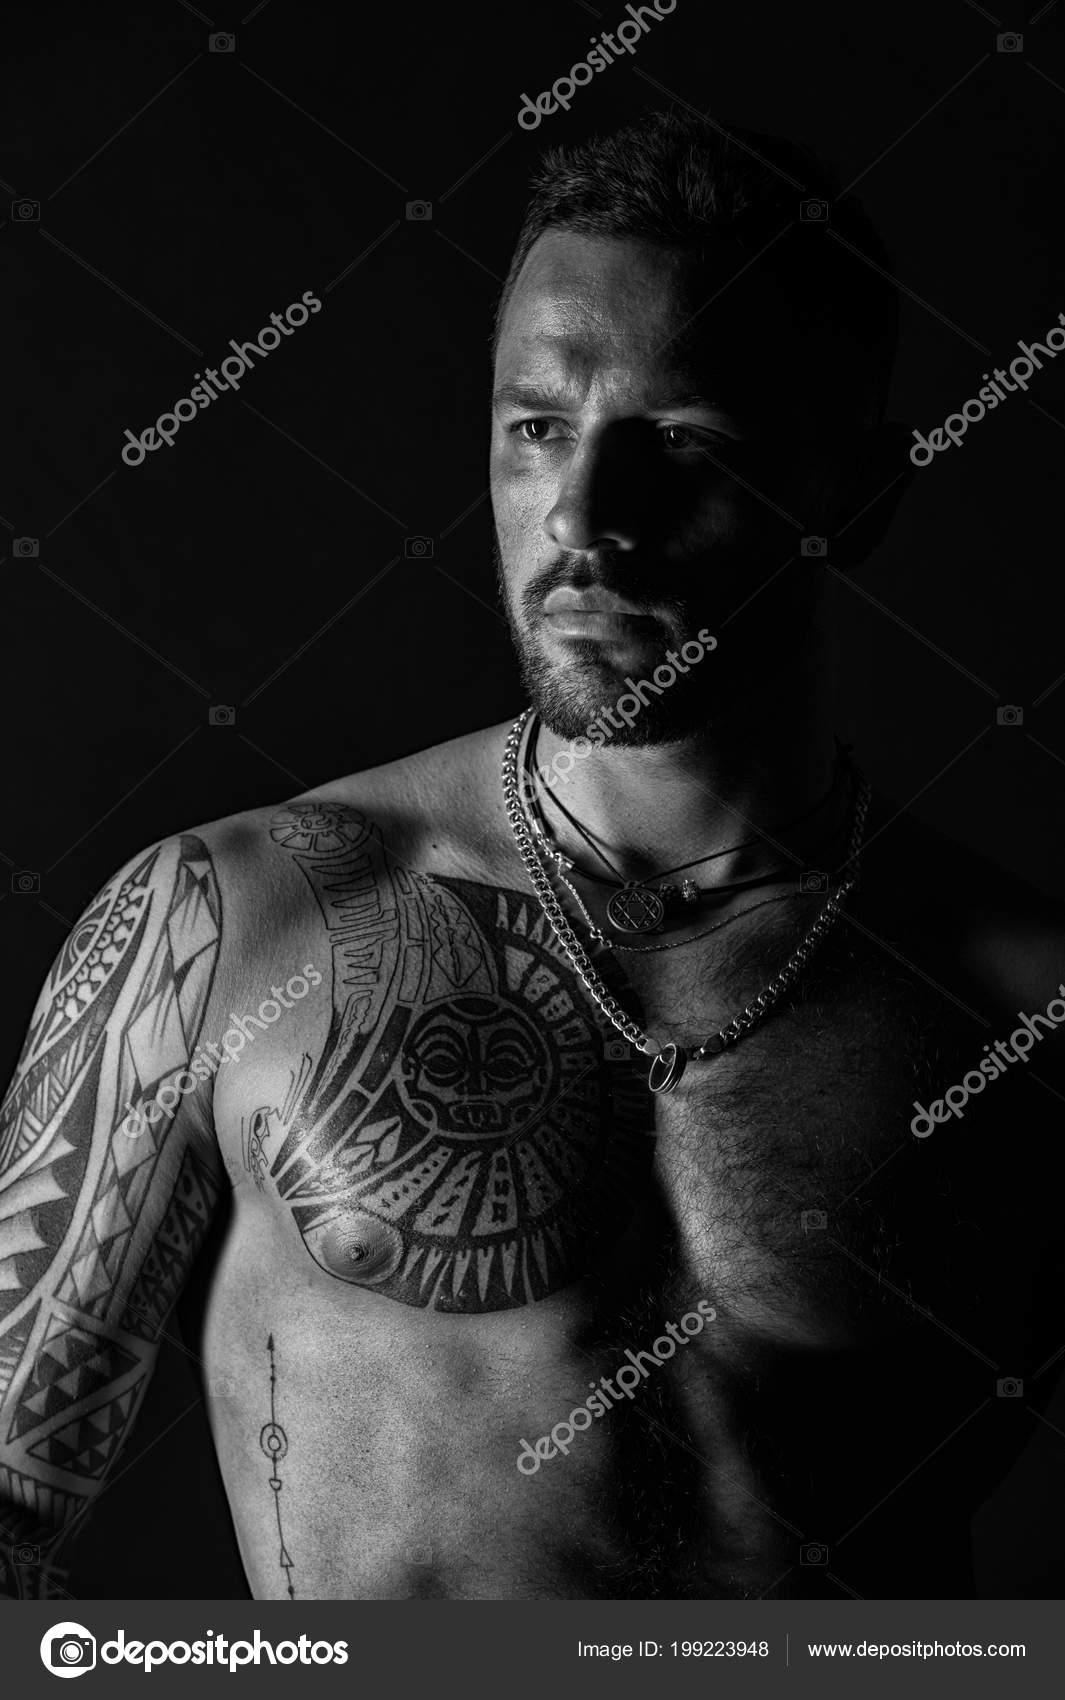 Homme Barbu Avec Poitrine Tatouee Homme Avec Sexy Torse Muscle